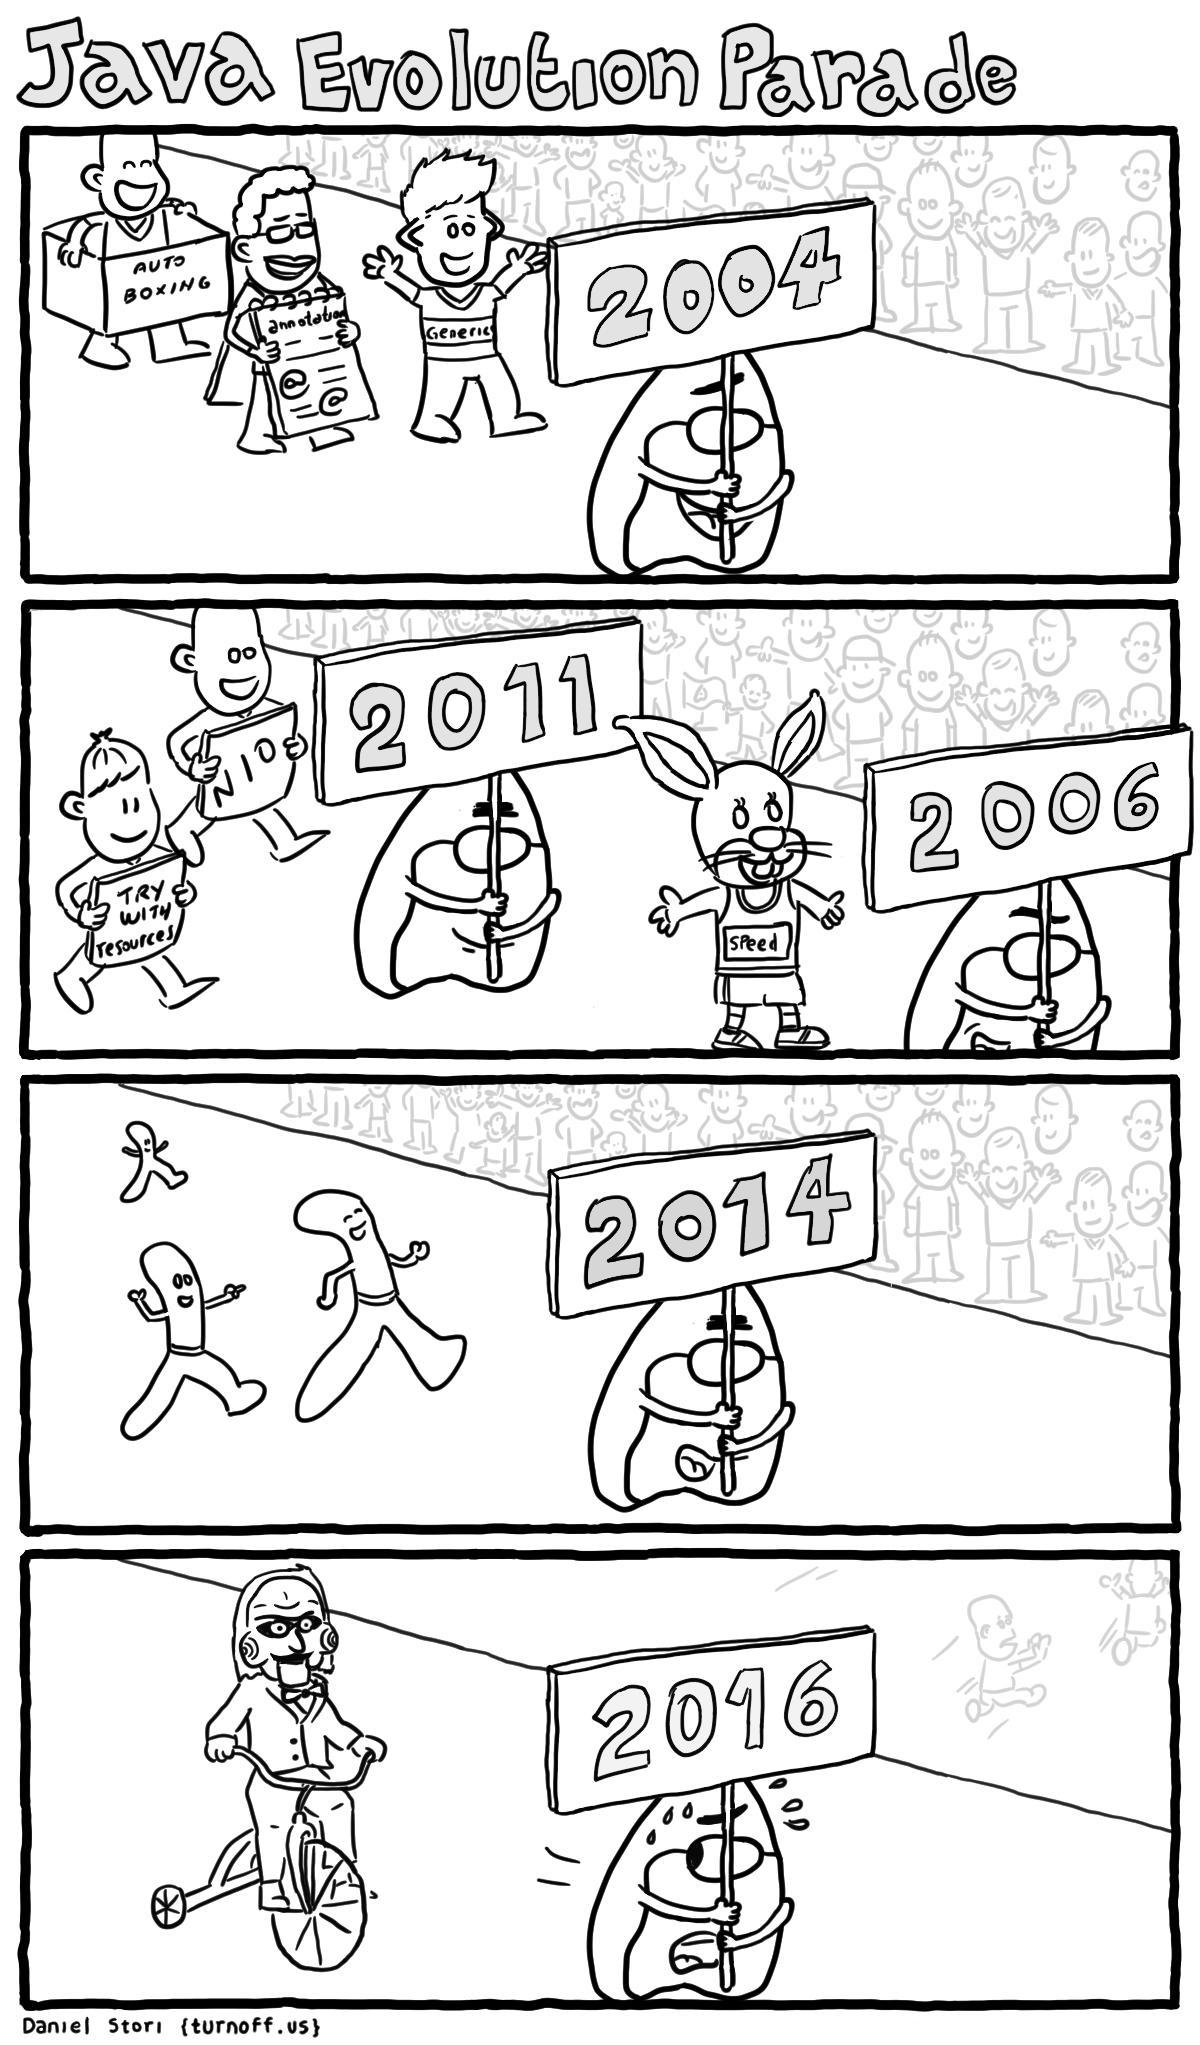 Java Evolution Parade